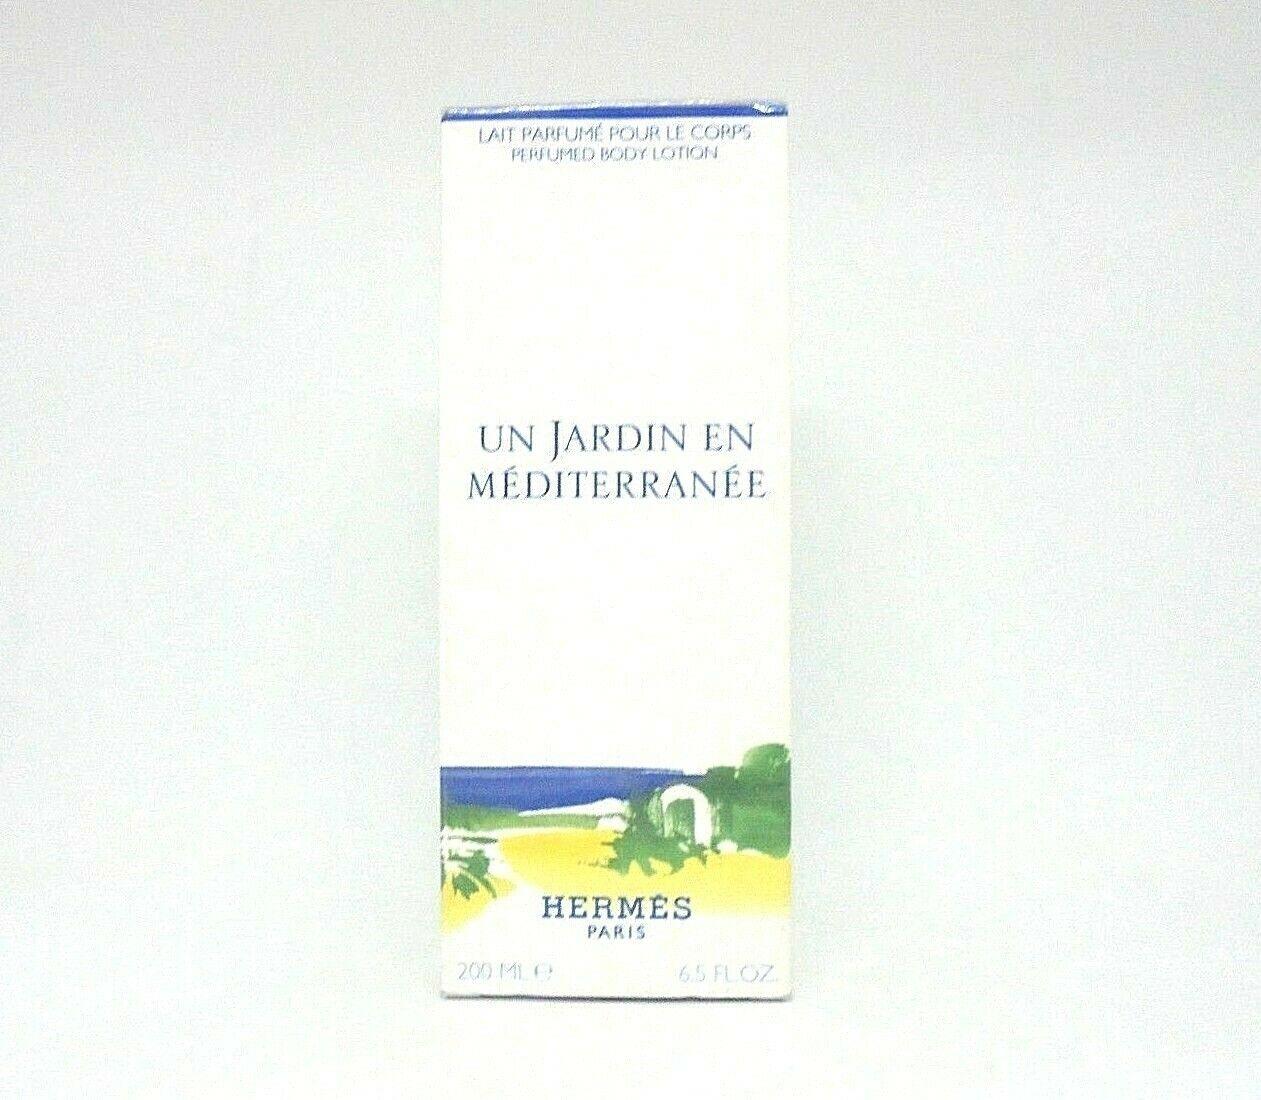 Hermes Un Jardin En Mediterranee Perfumed Body Lotion ~ 6.5 Oz Bnib pour Un Jardin En Méditerranée